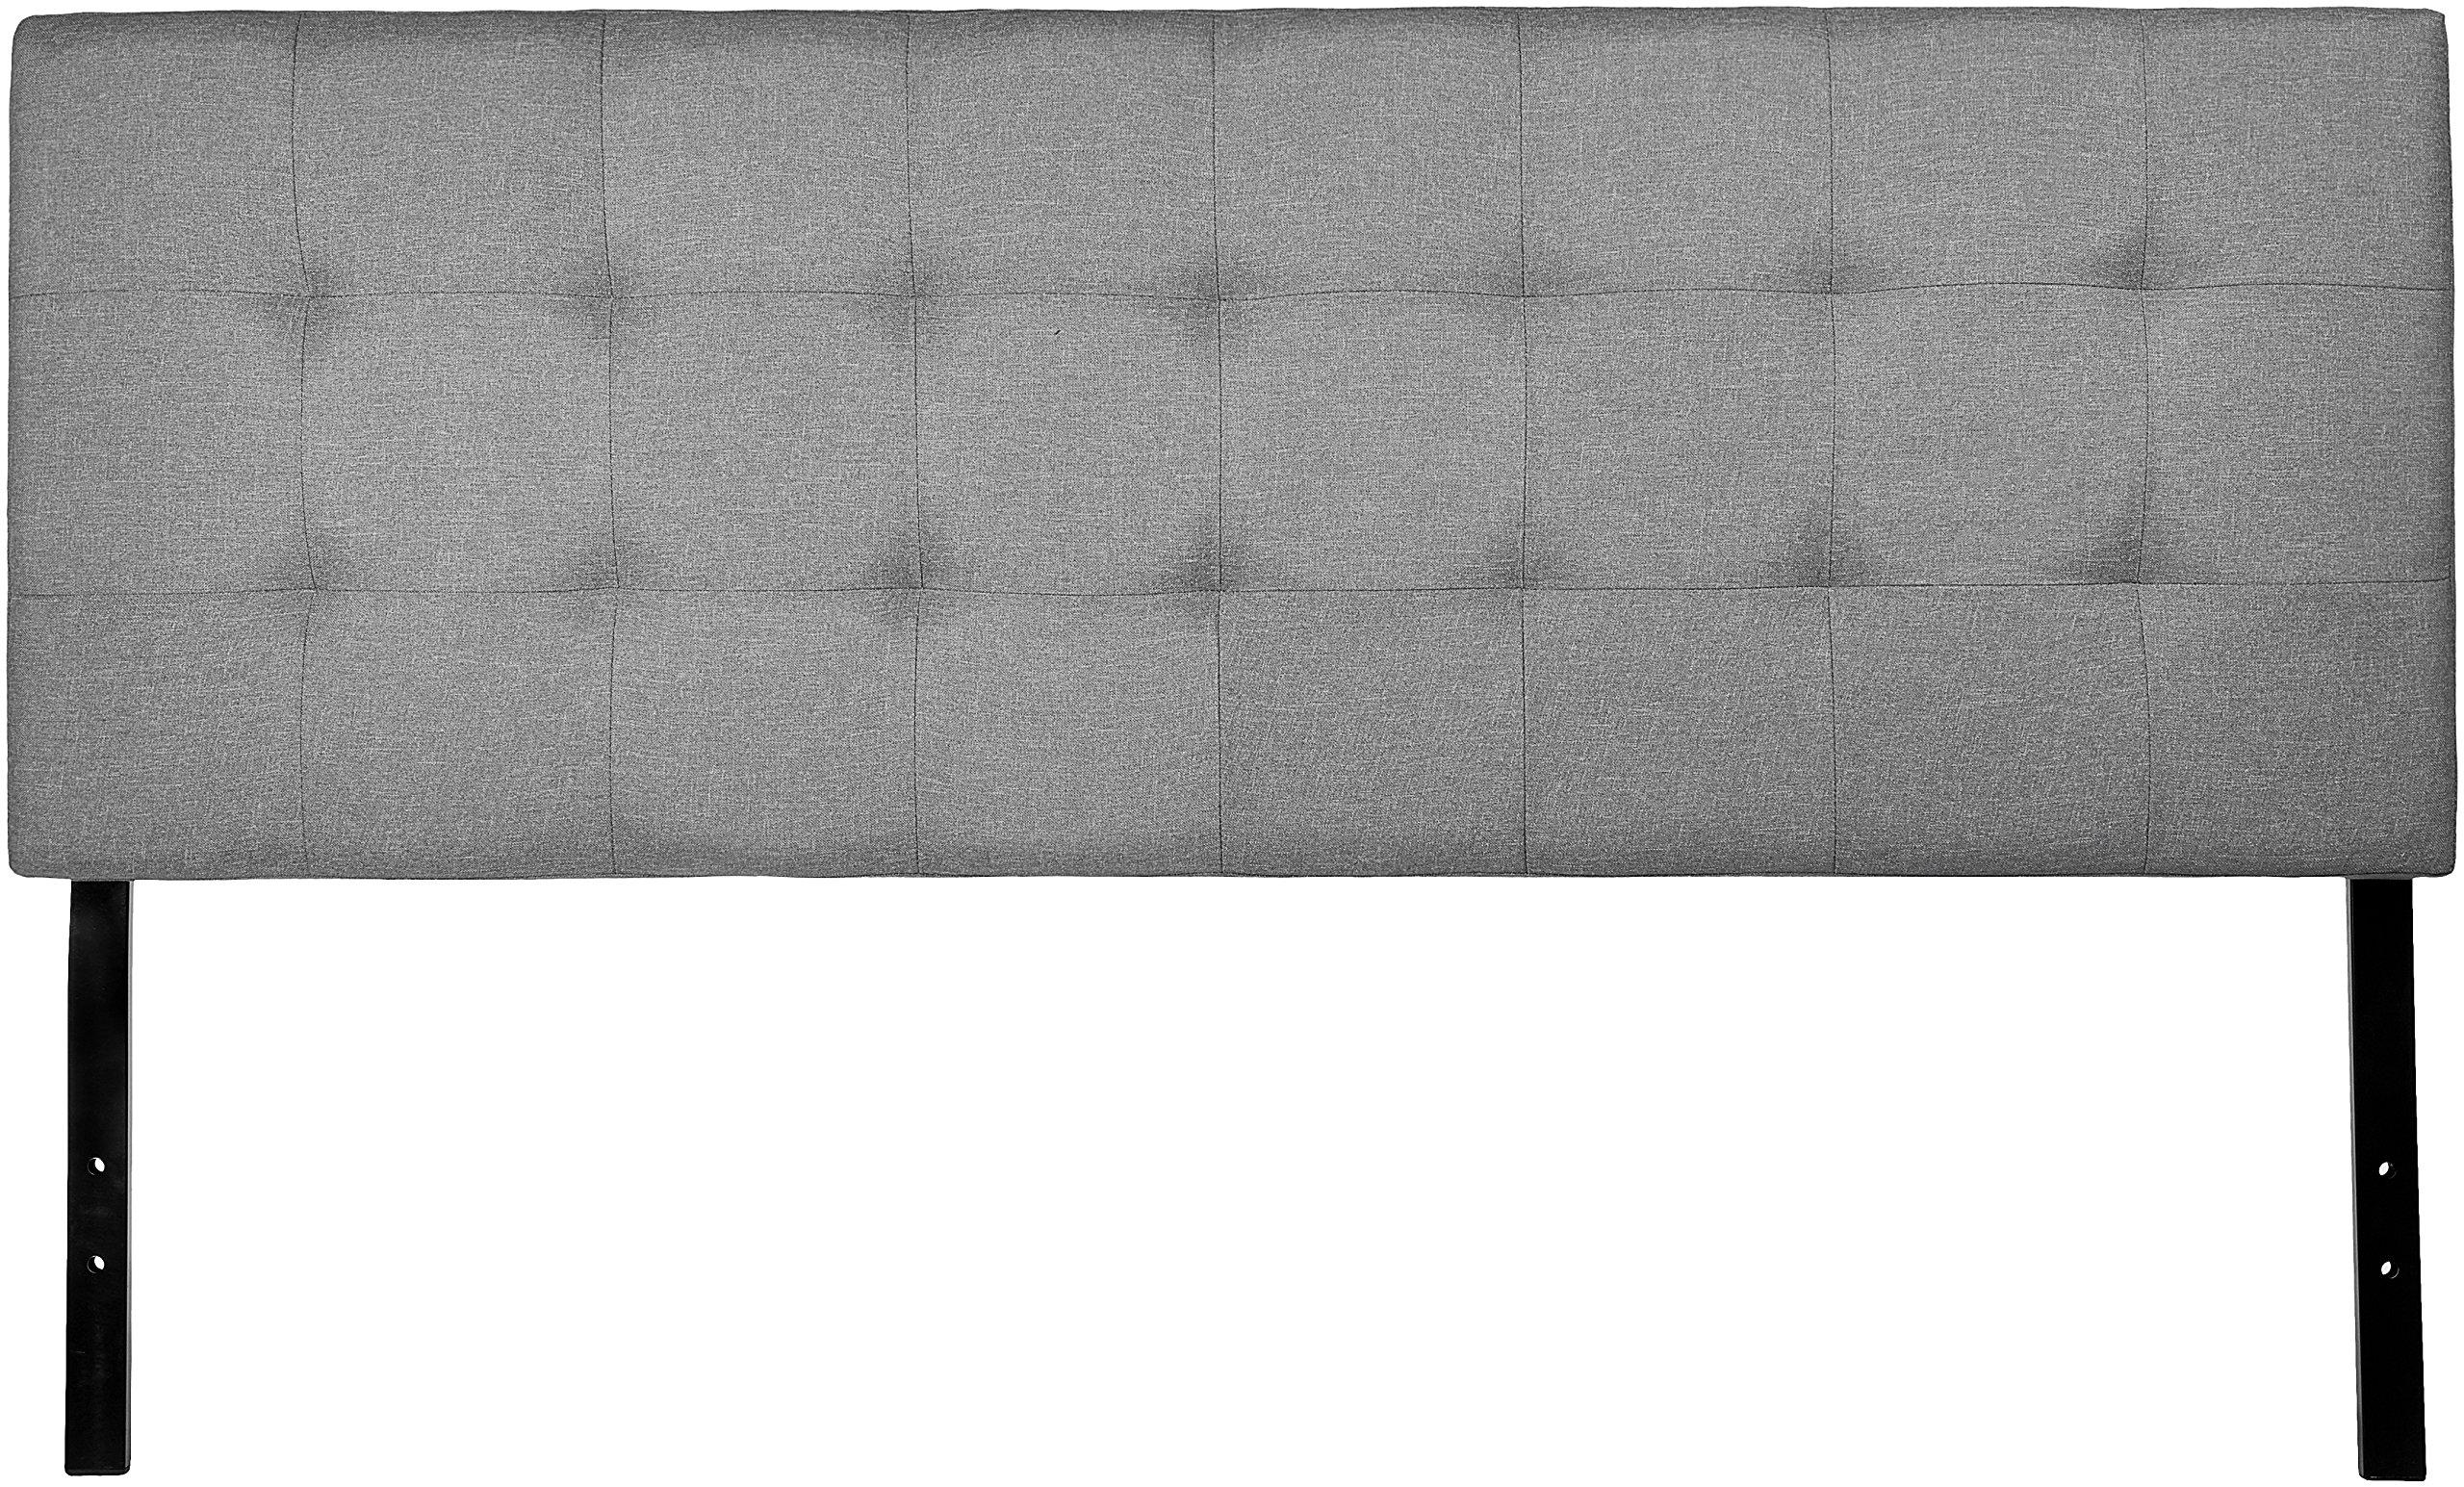 AmazonBasics Faux Linen Upholstered Tufted Headboard - Full, Grey by AmazonBasics